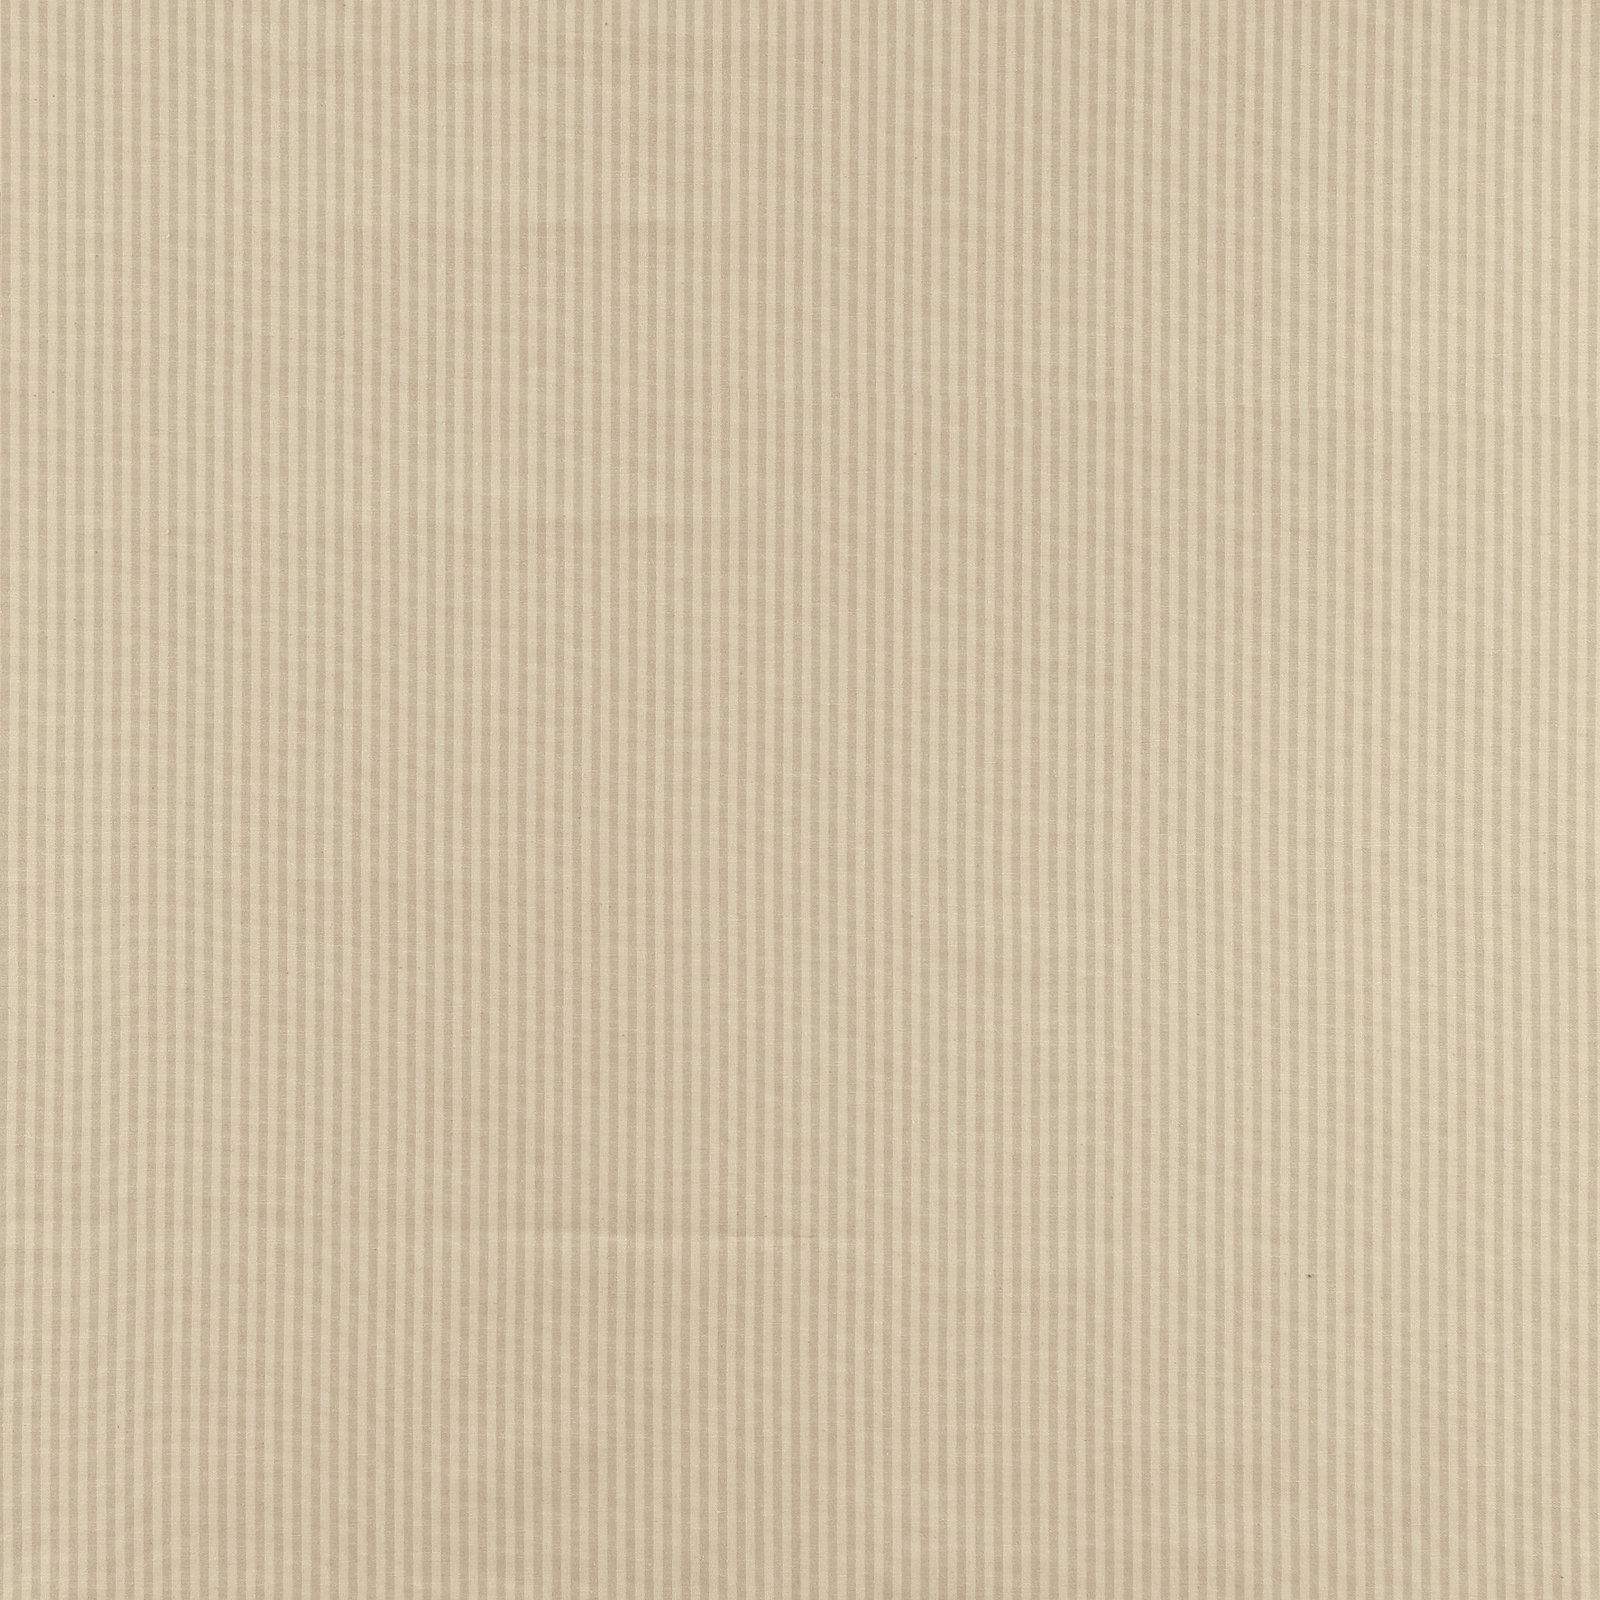 Yarn dyed off white/sand narrow stripe